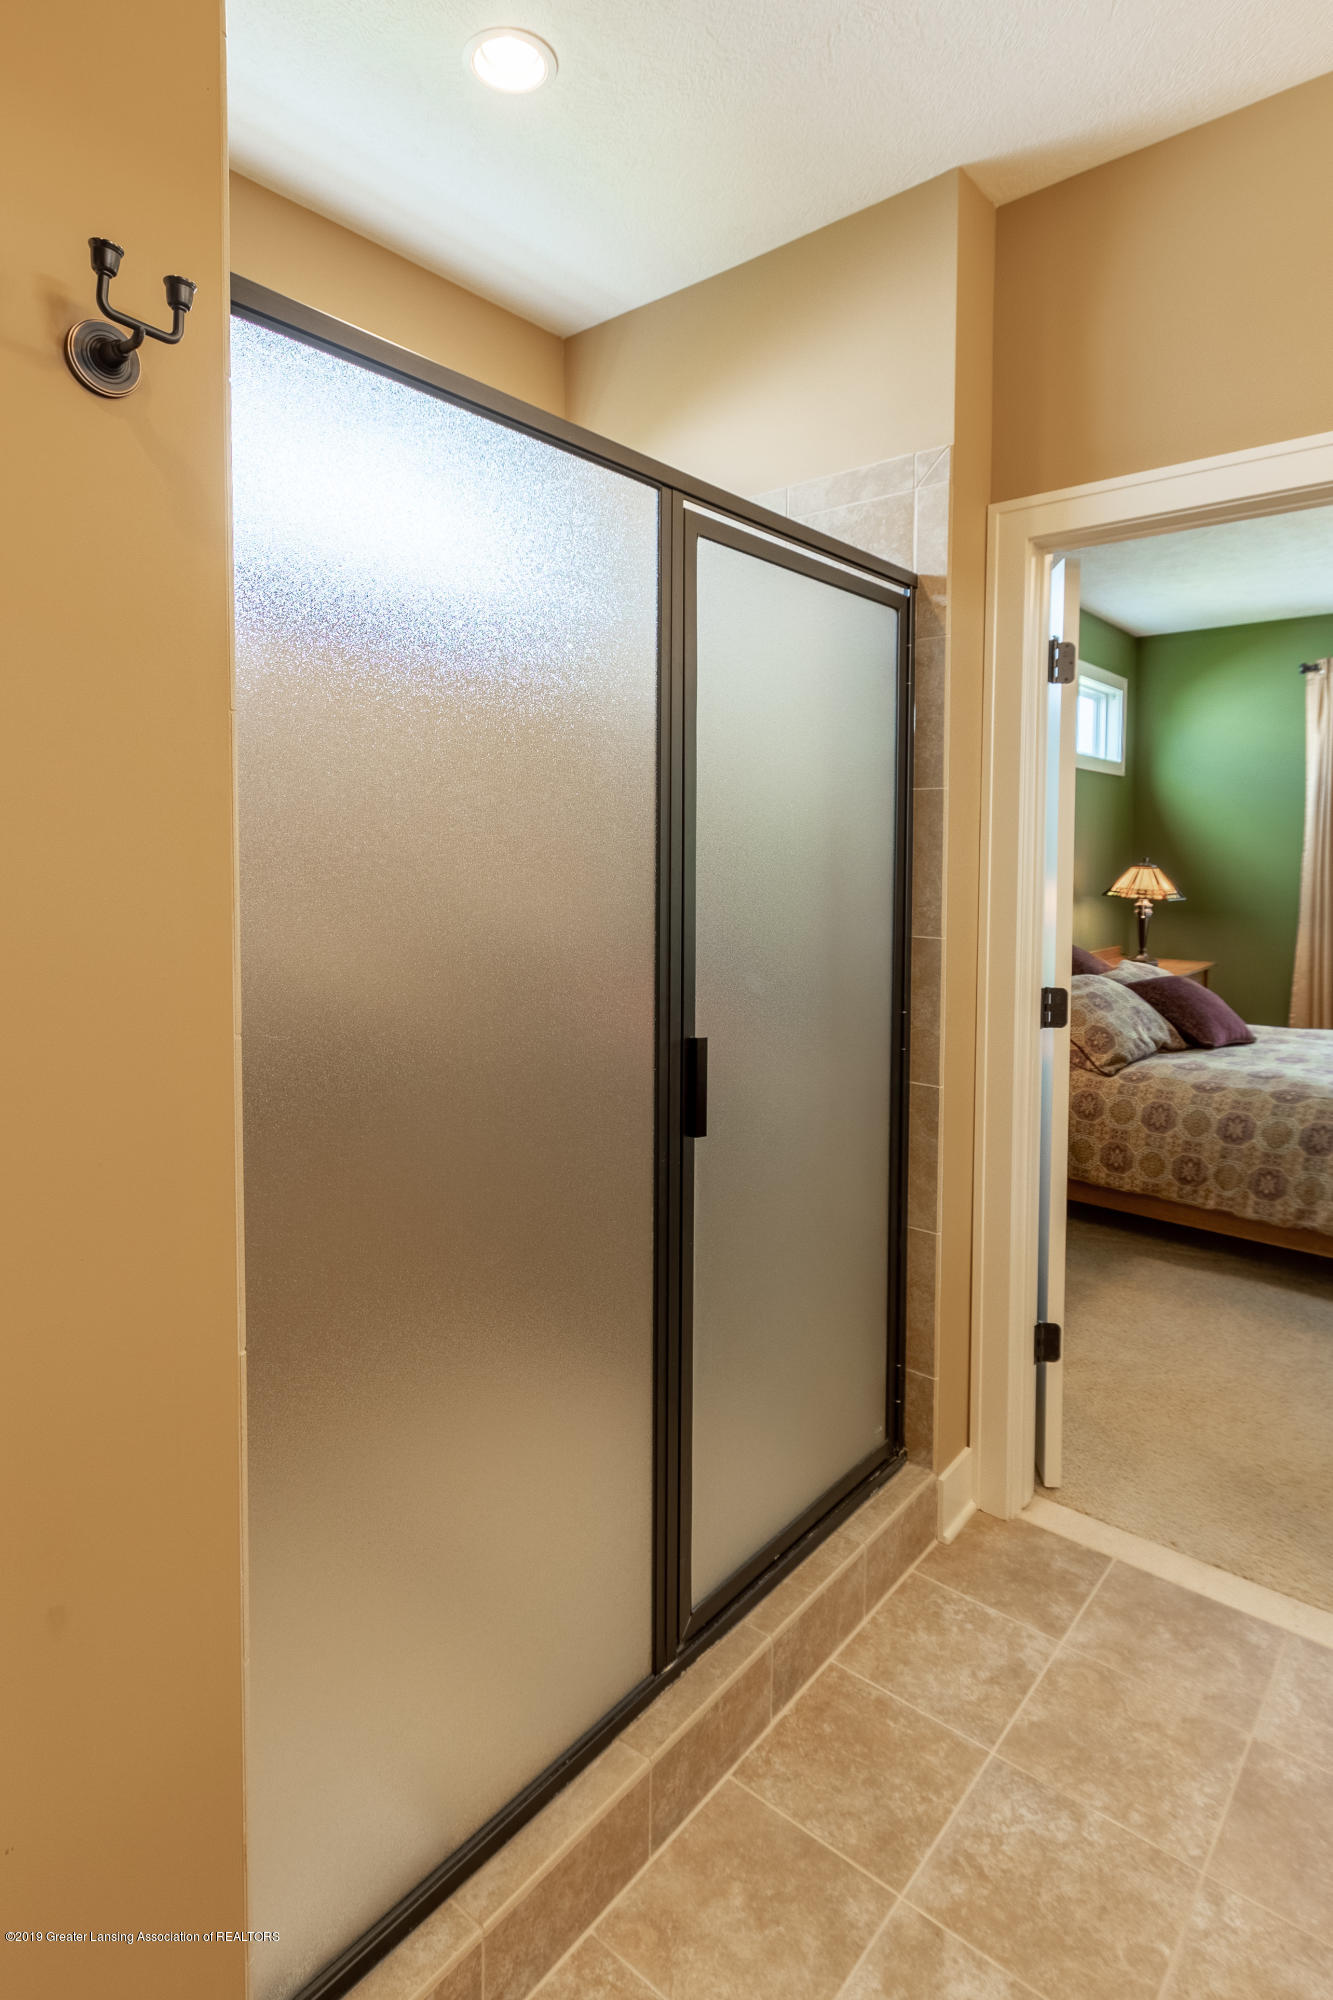 4134 E Benca Way - First Floor Master Bathroom - 42